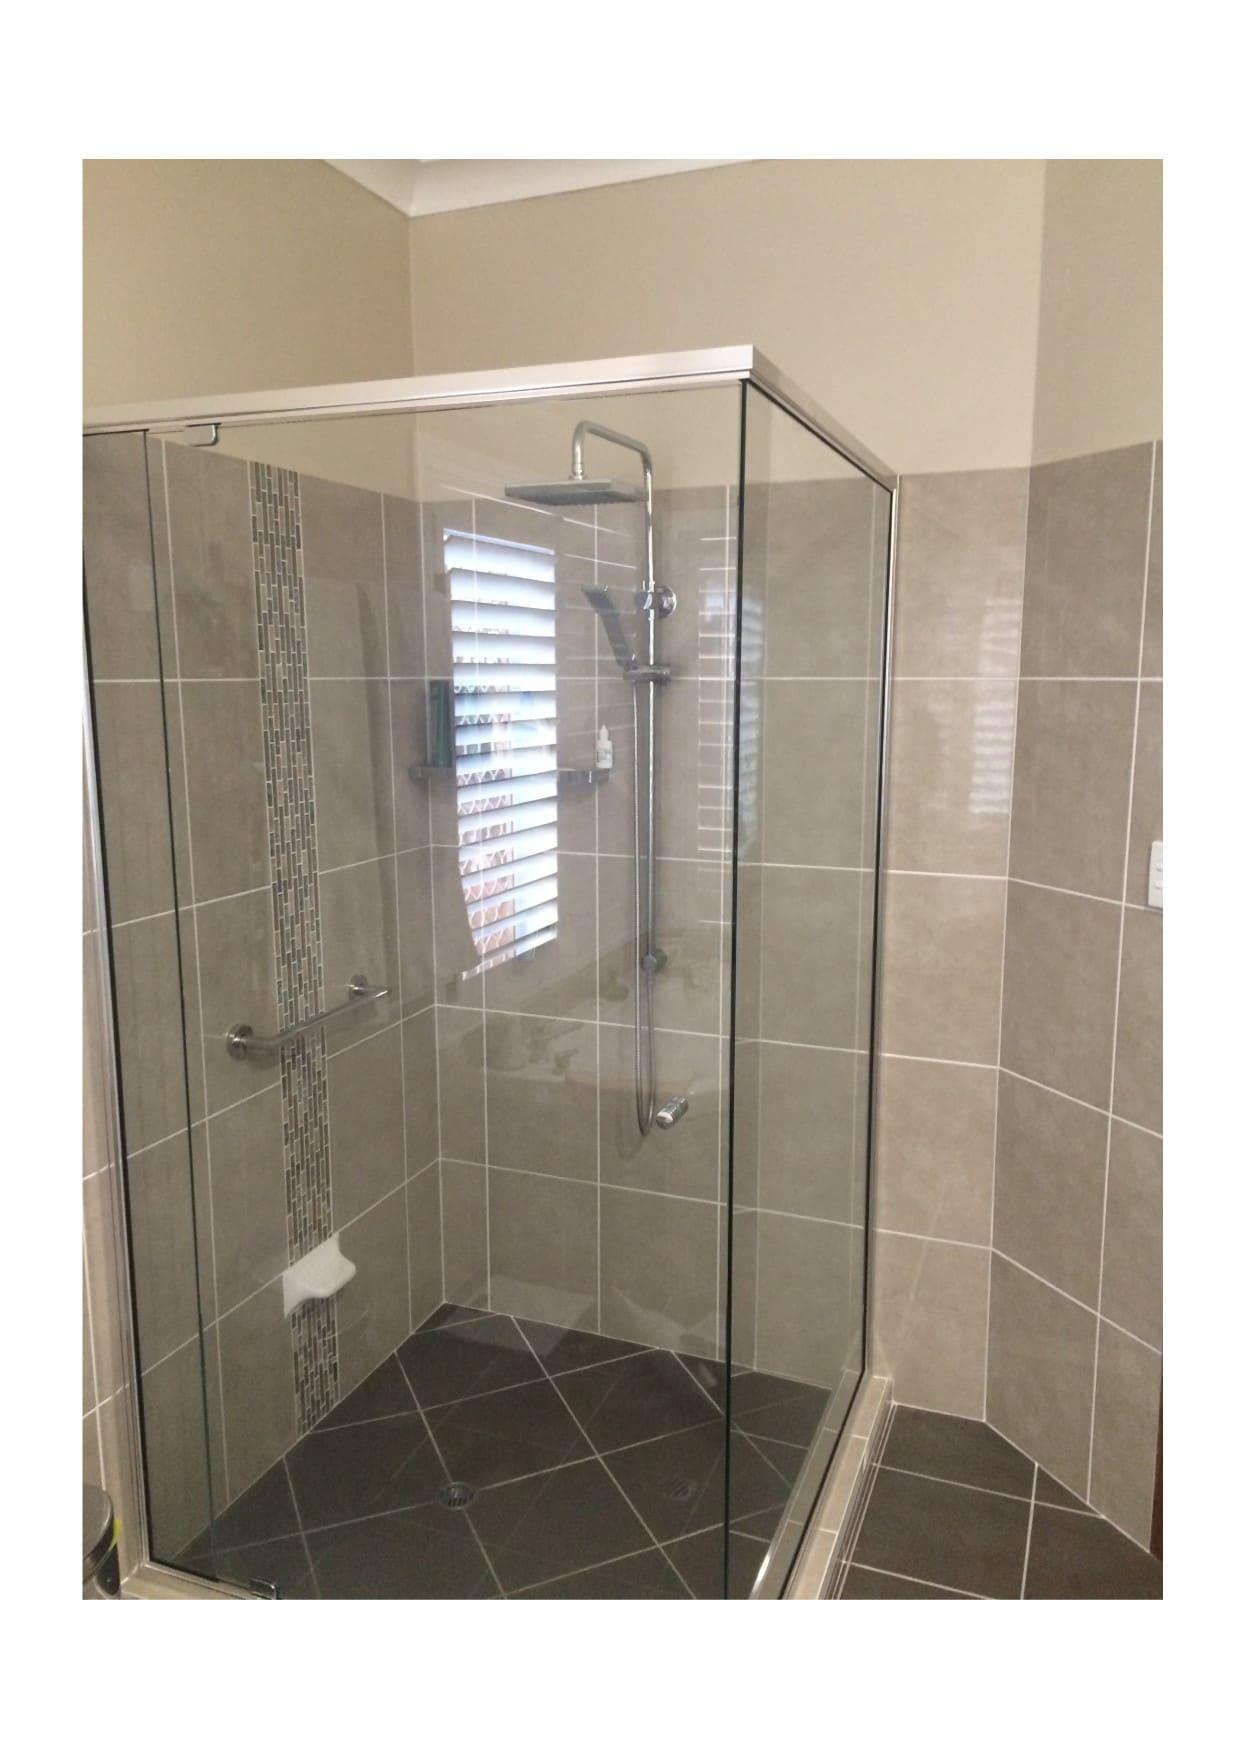 Toowoomba bathroom renovations - Bathroom Renovations Toowoomba Toowoomba Bathroom Renovations Bathroom Renovations Designs